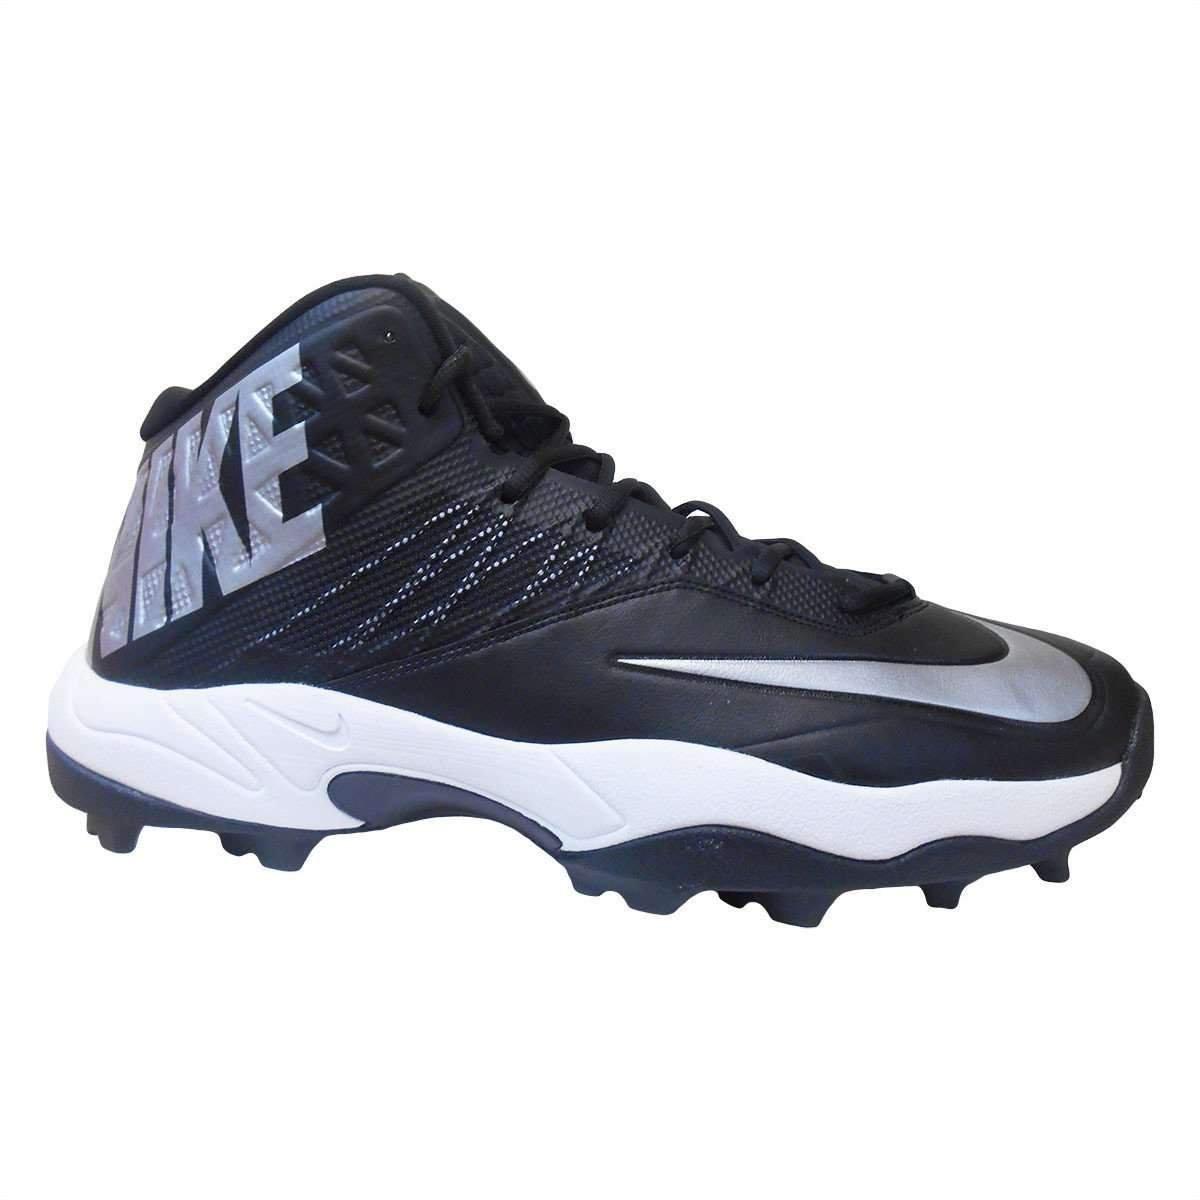 Nike メンズ B01MUBSILA 15 D(M) US|ブラック ブラック 15 D(M) US